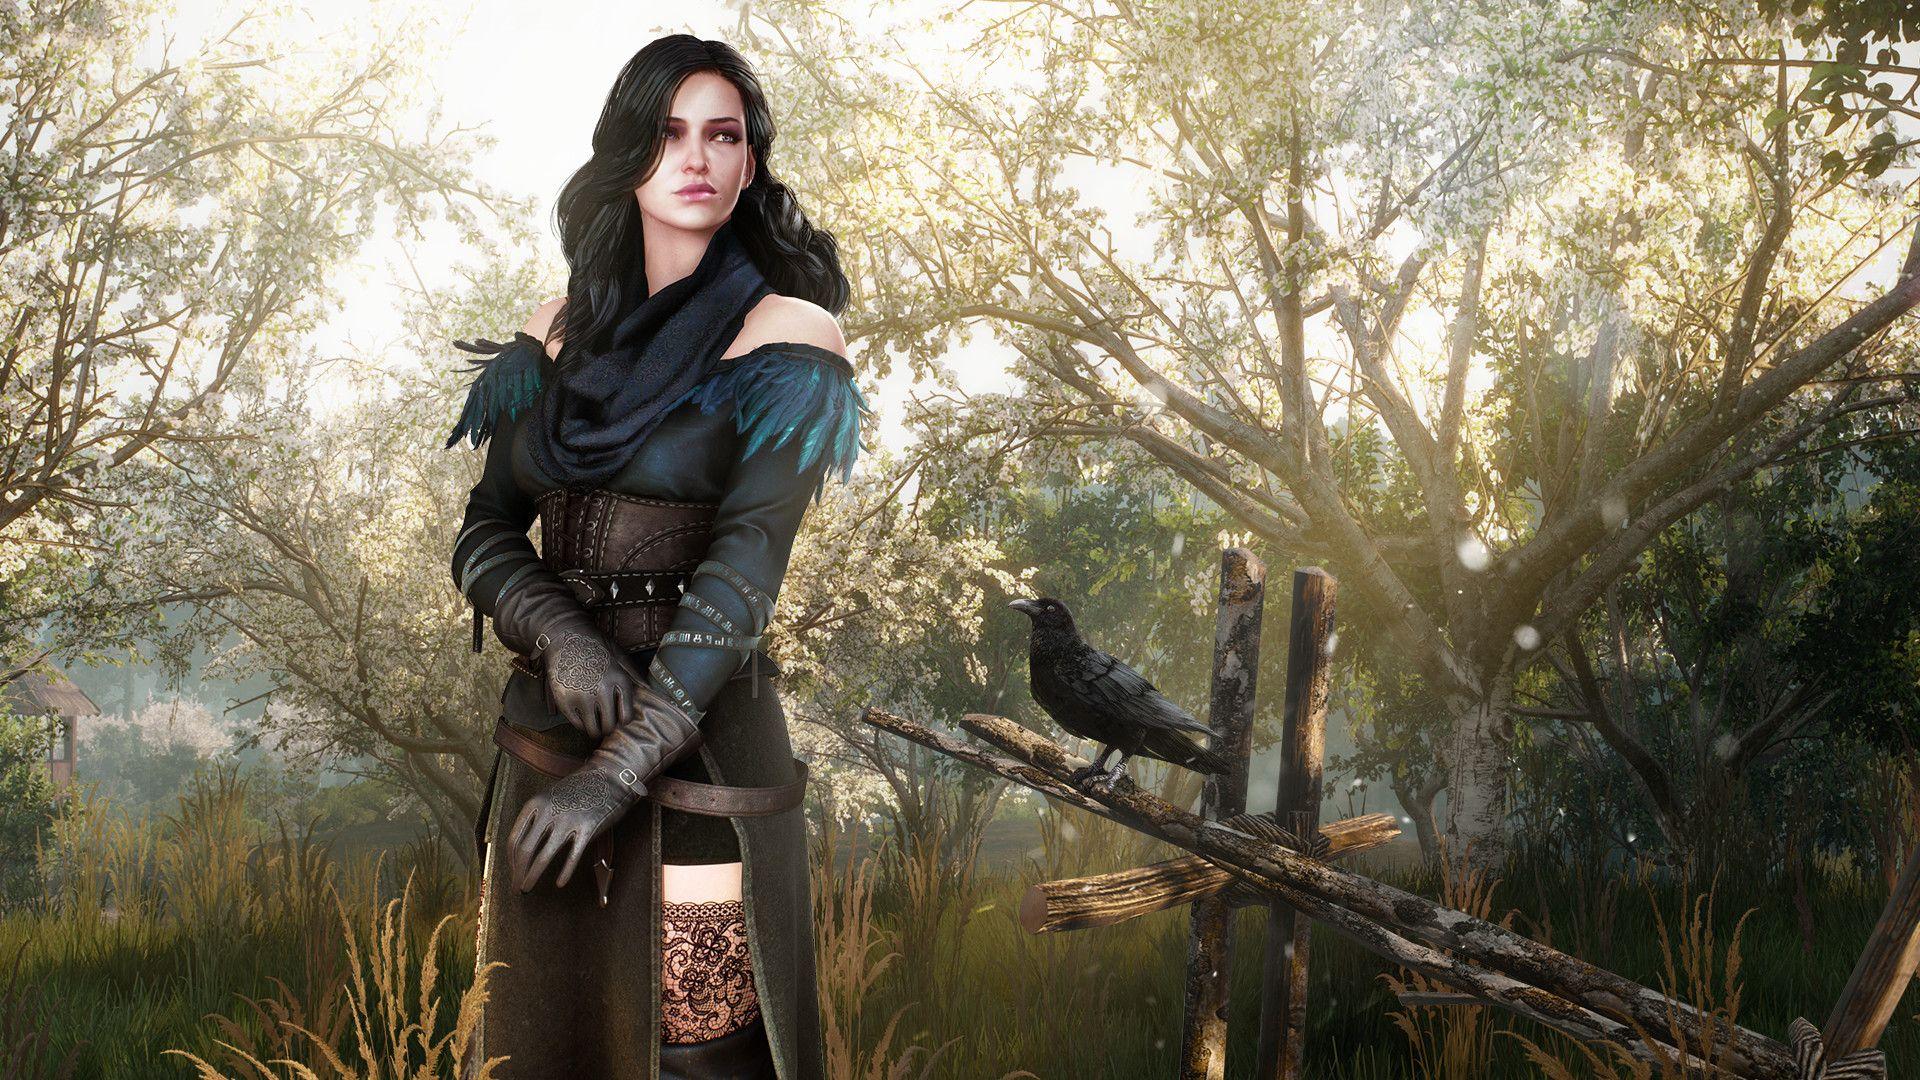 Witcher Yennefer, Wallpaper